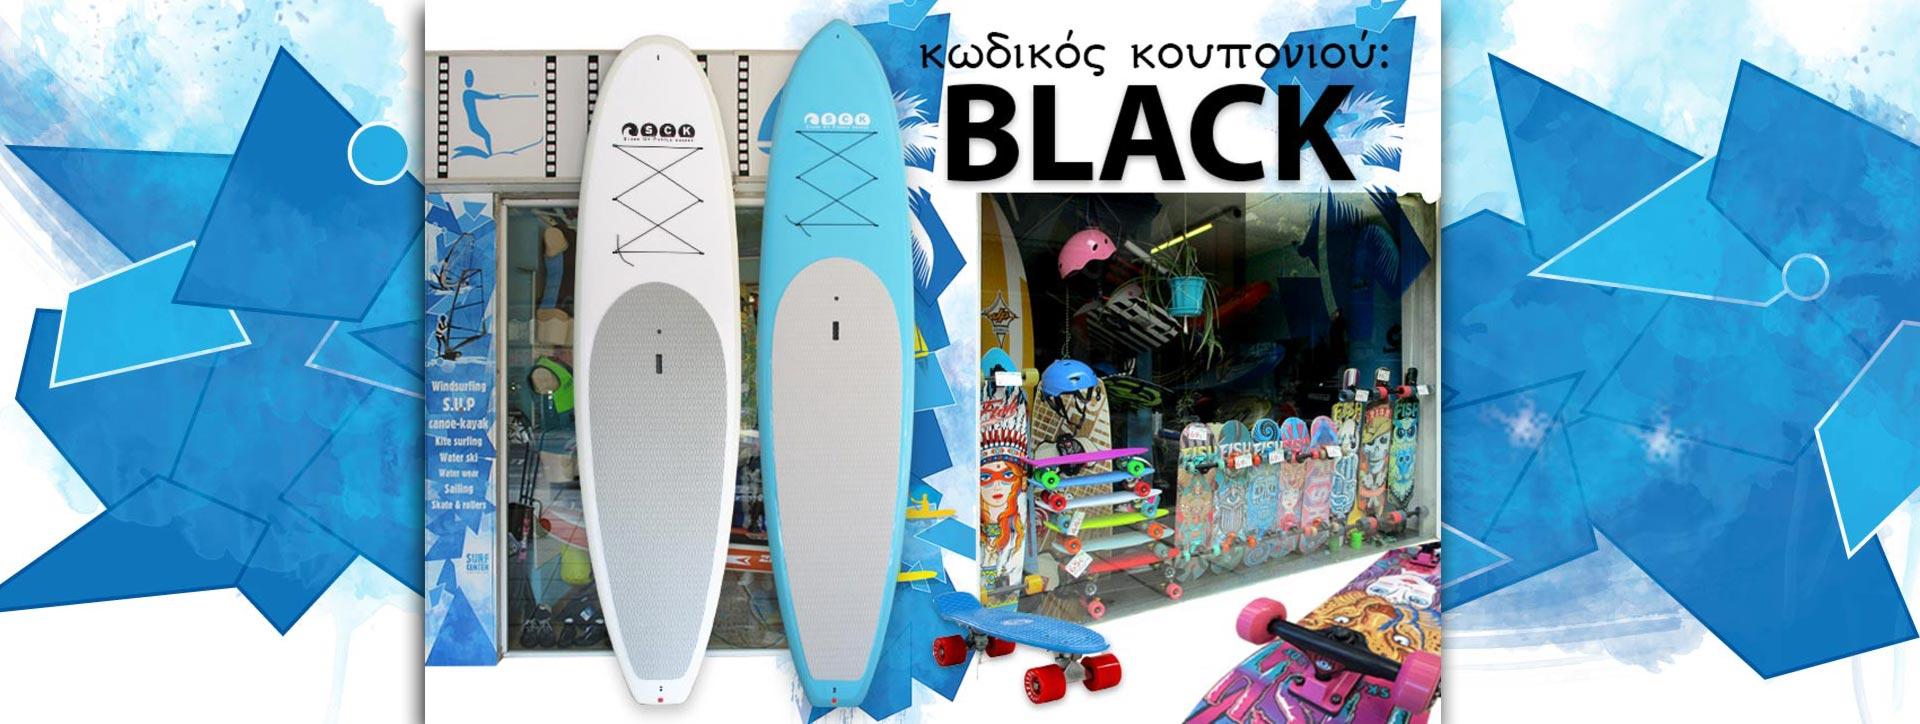 Black_friday_code